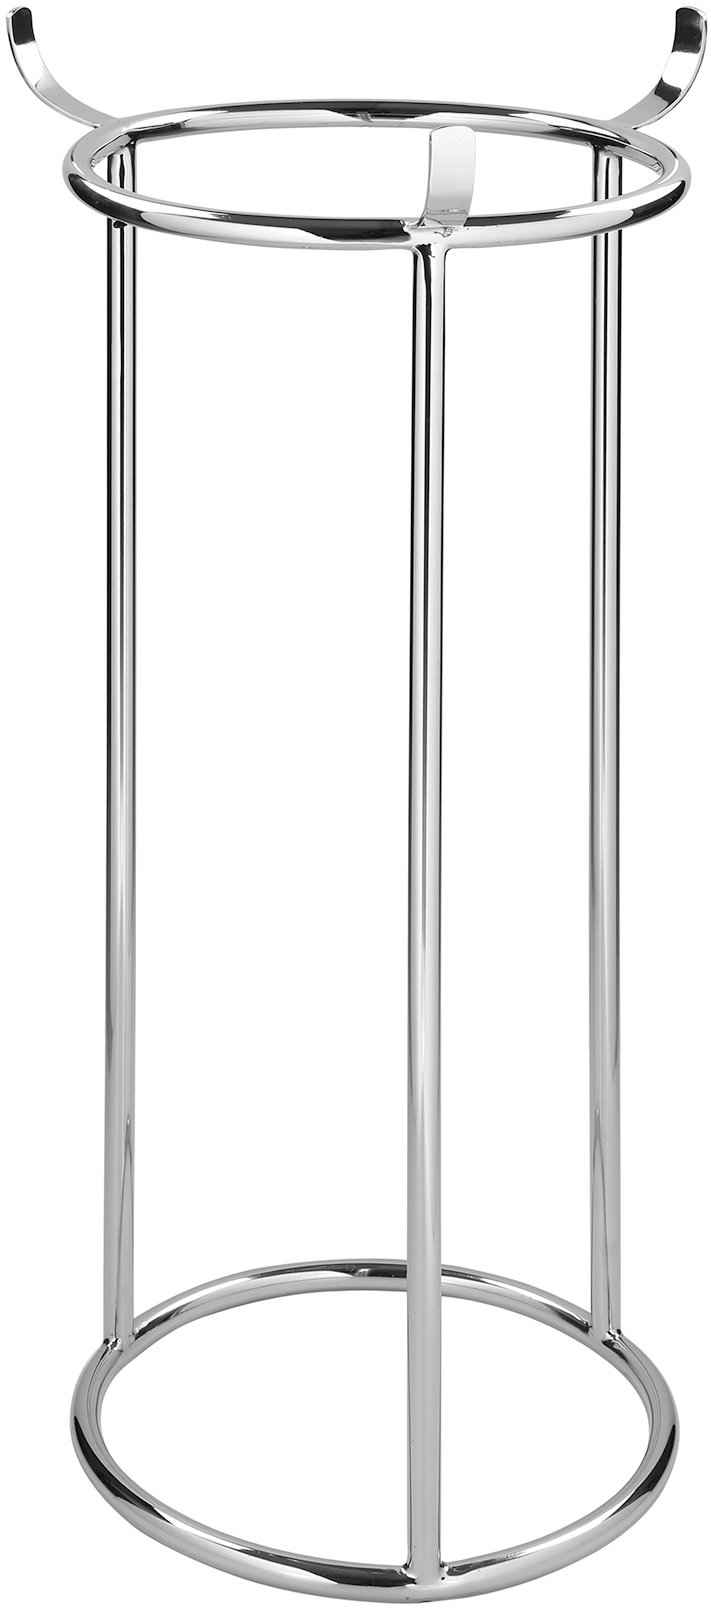 Fink Standfuß »CORONA« (1 Stück), Kerzenständer für Dekokranz CORONA D. 40 cm